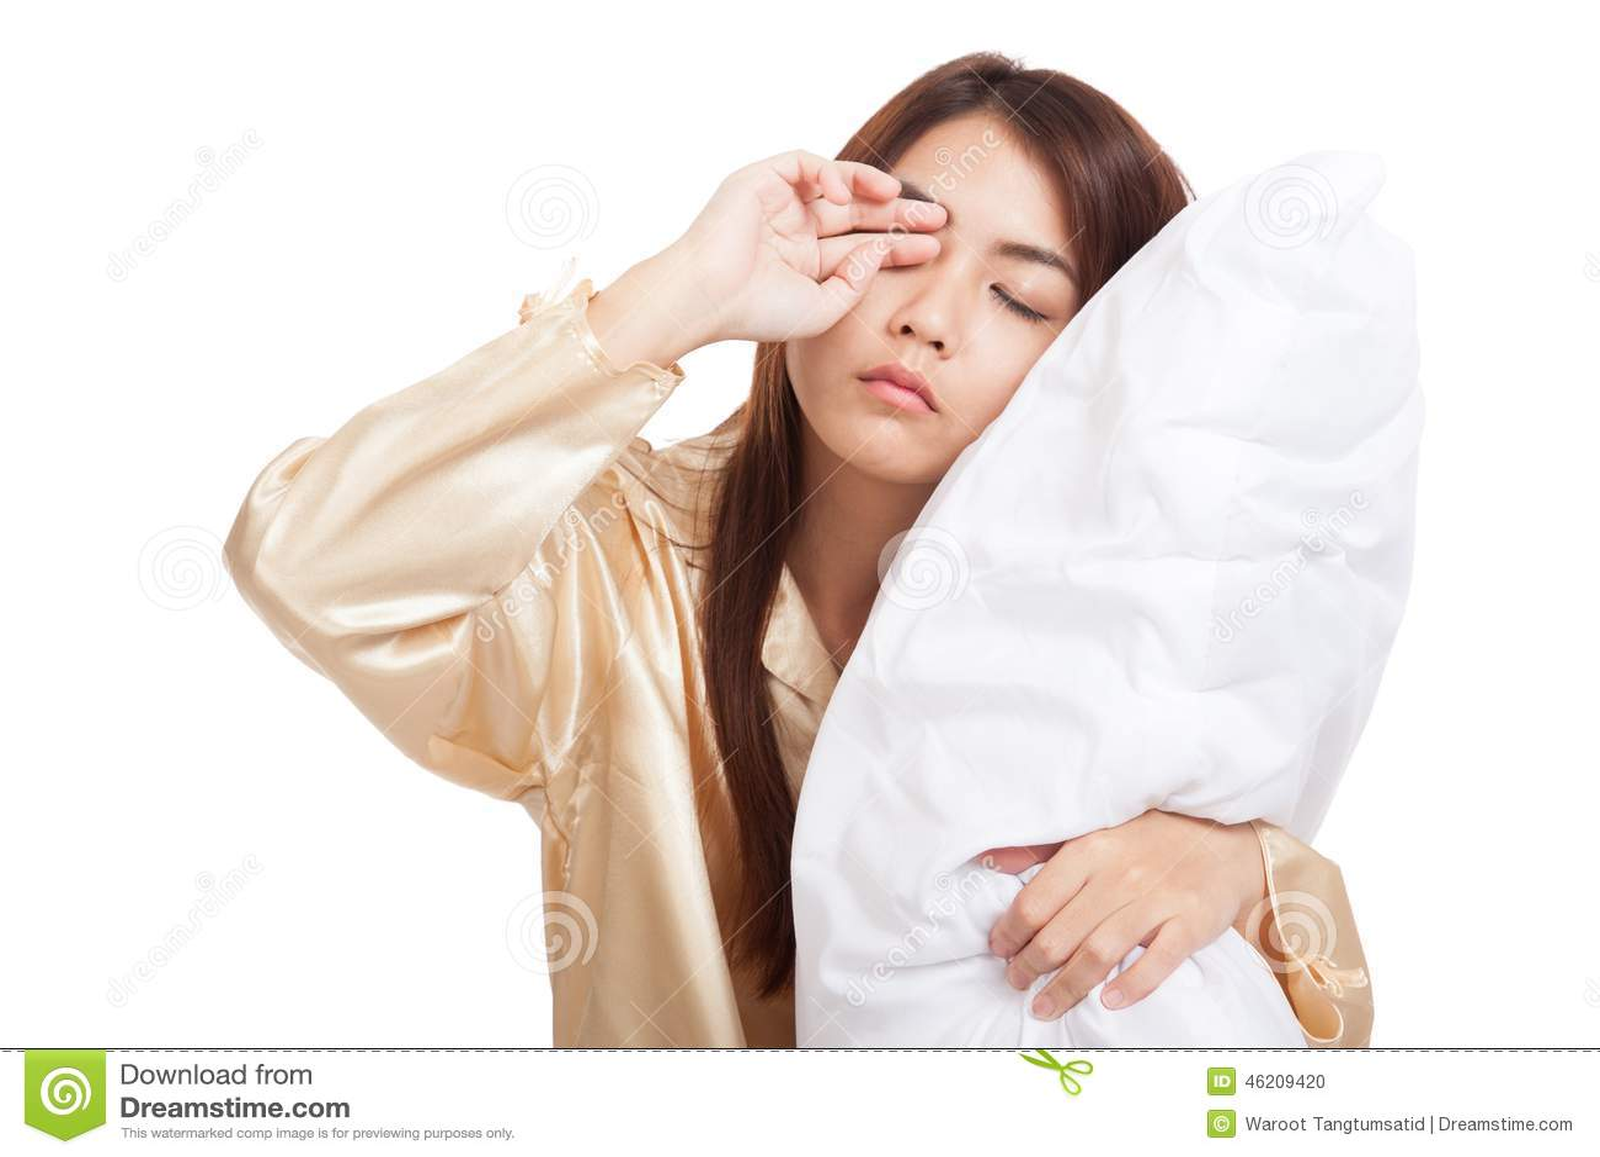 Aziatisch meisjeskielzog omhoog slaperig en slaperig met hoofdkussen